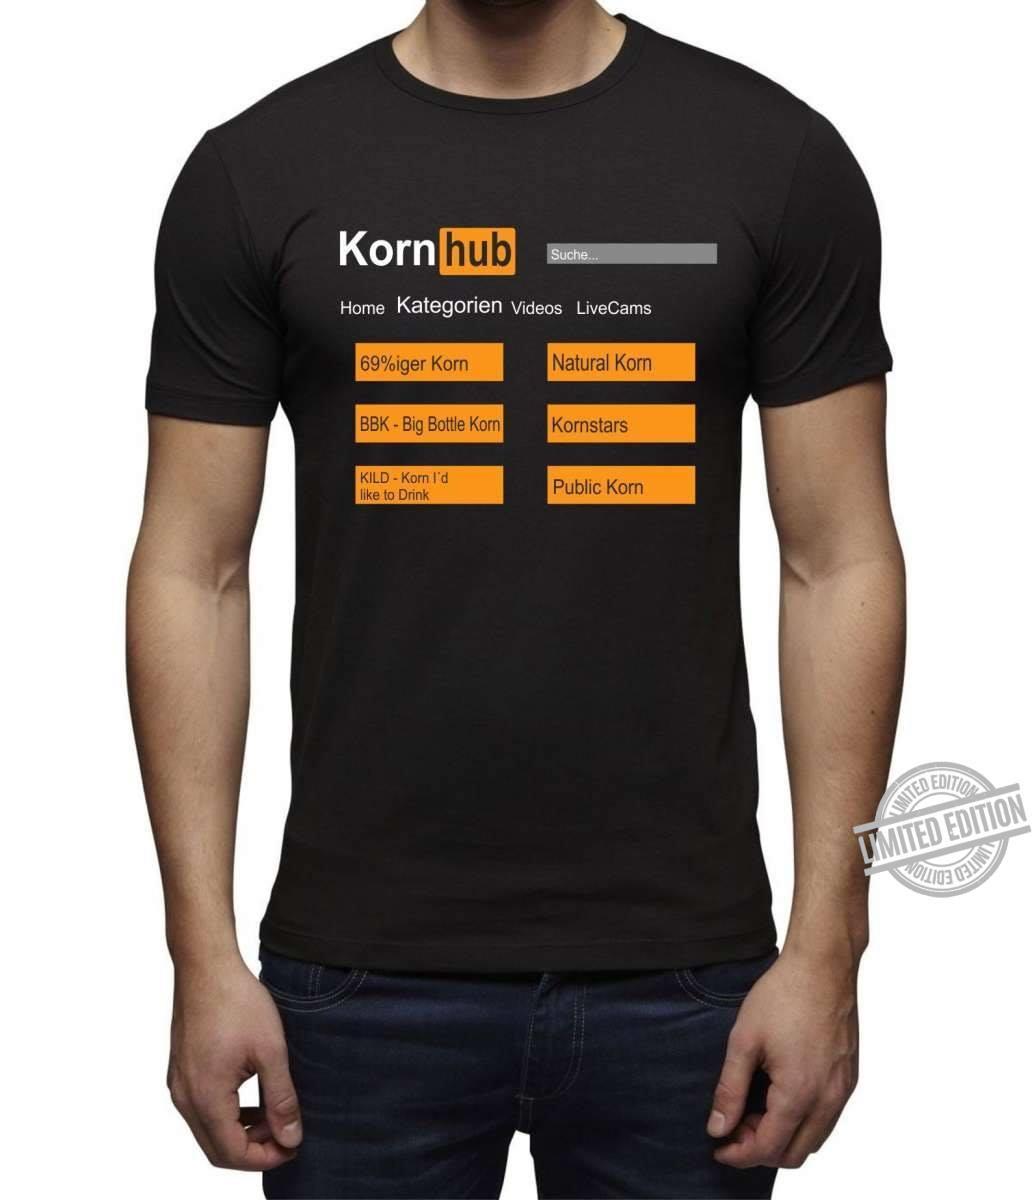 Korn Hub Home Kategorien Videos Livecams Shirt